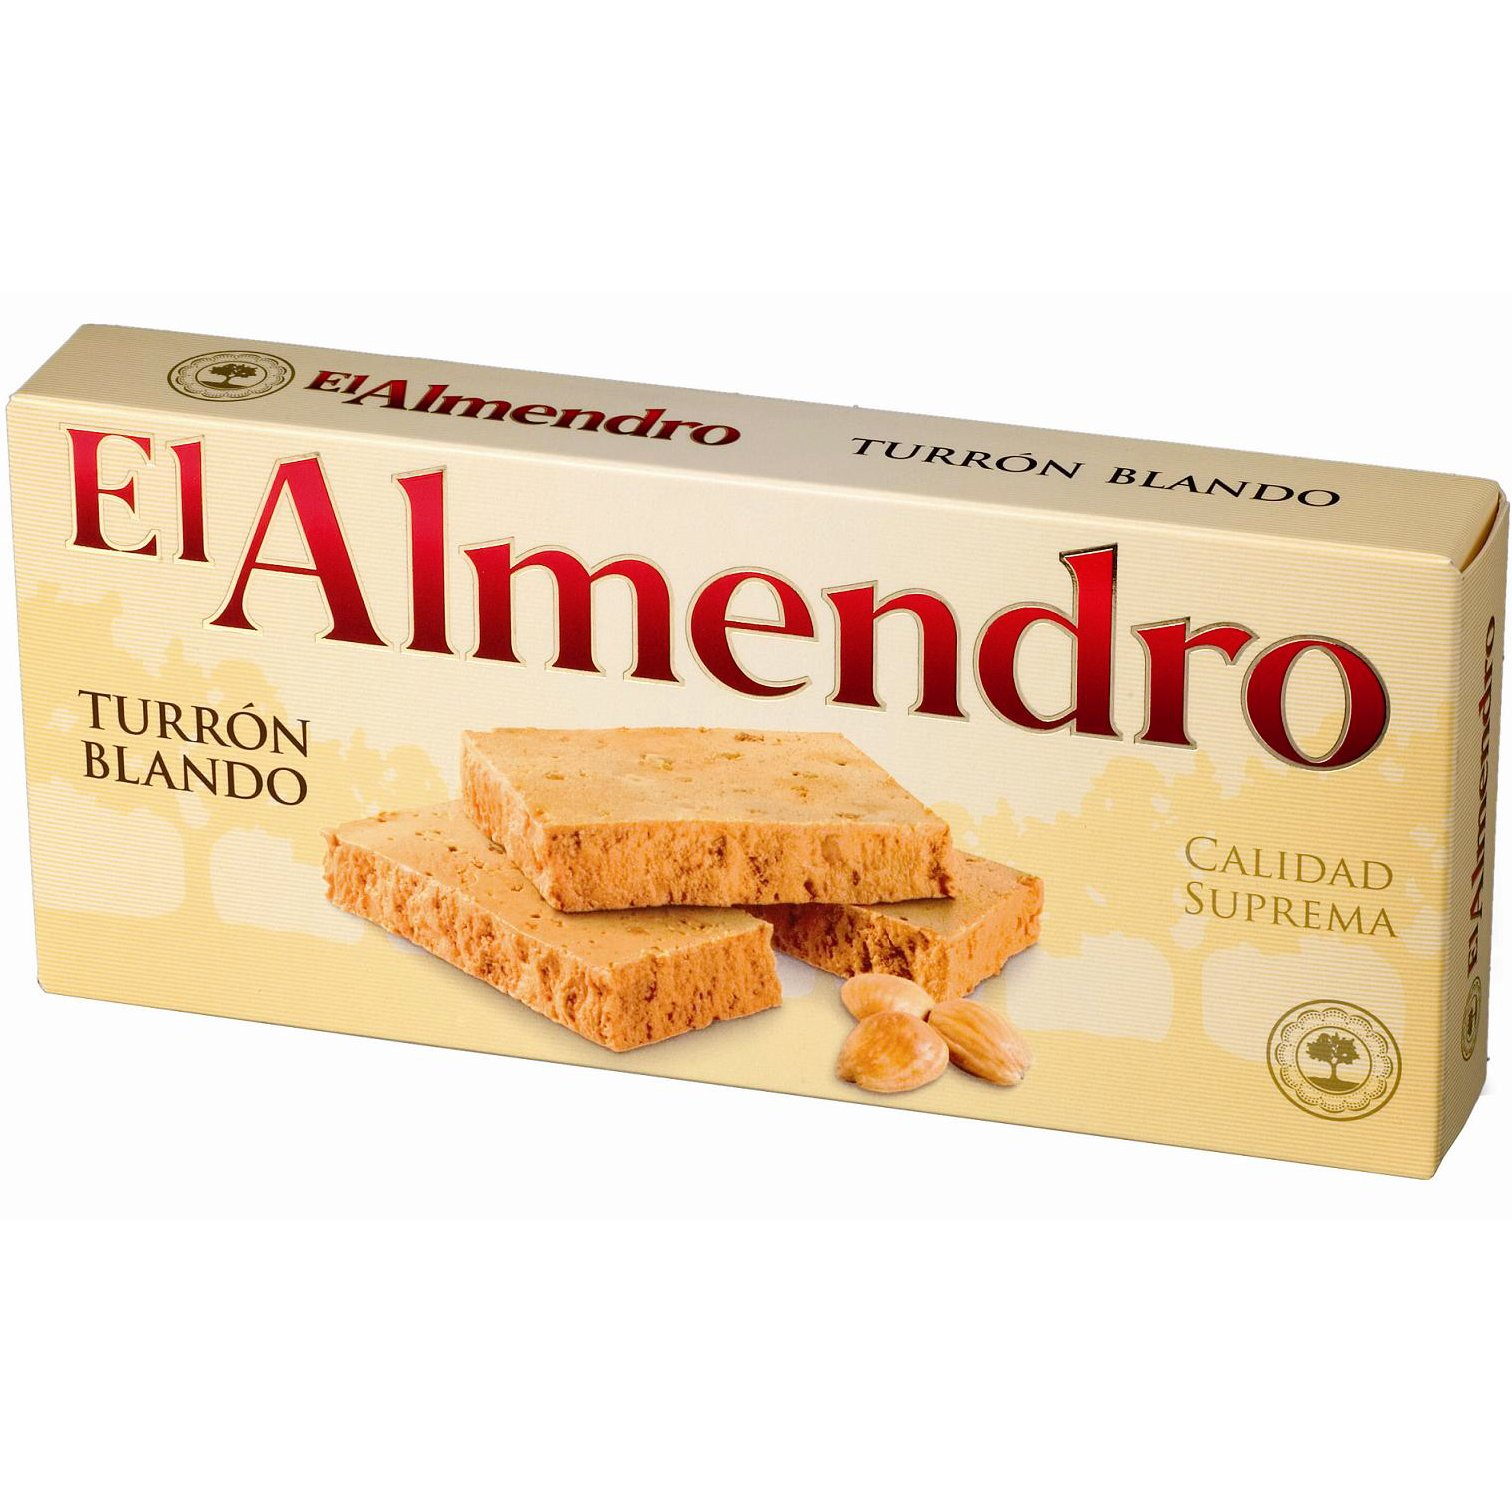 El Almendro Turron Blando 200 grs (7 oz.) 2-Pack